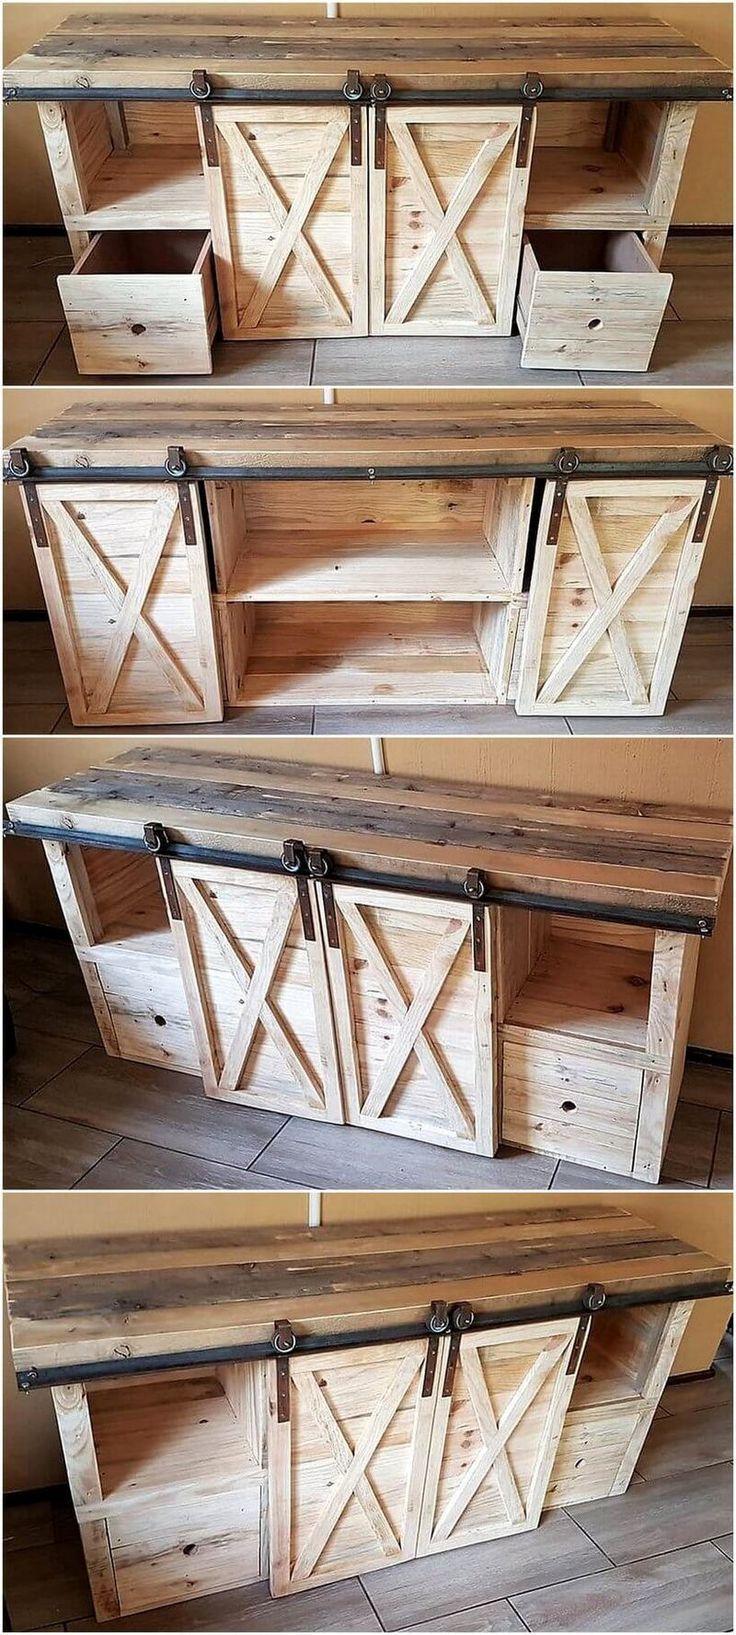 Rustikale #Palette #Holz #Ideen #und #Projekte # | #Rustikal #Wohnen #und #Wohnen #Dekorieren #Ideen. #palettenideen